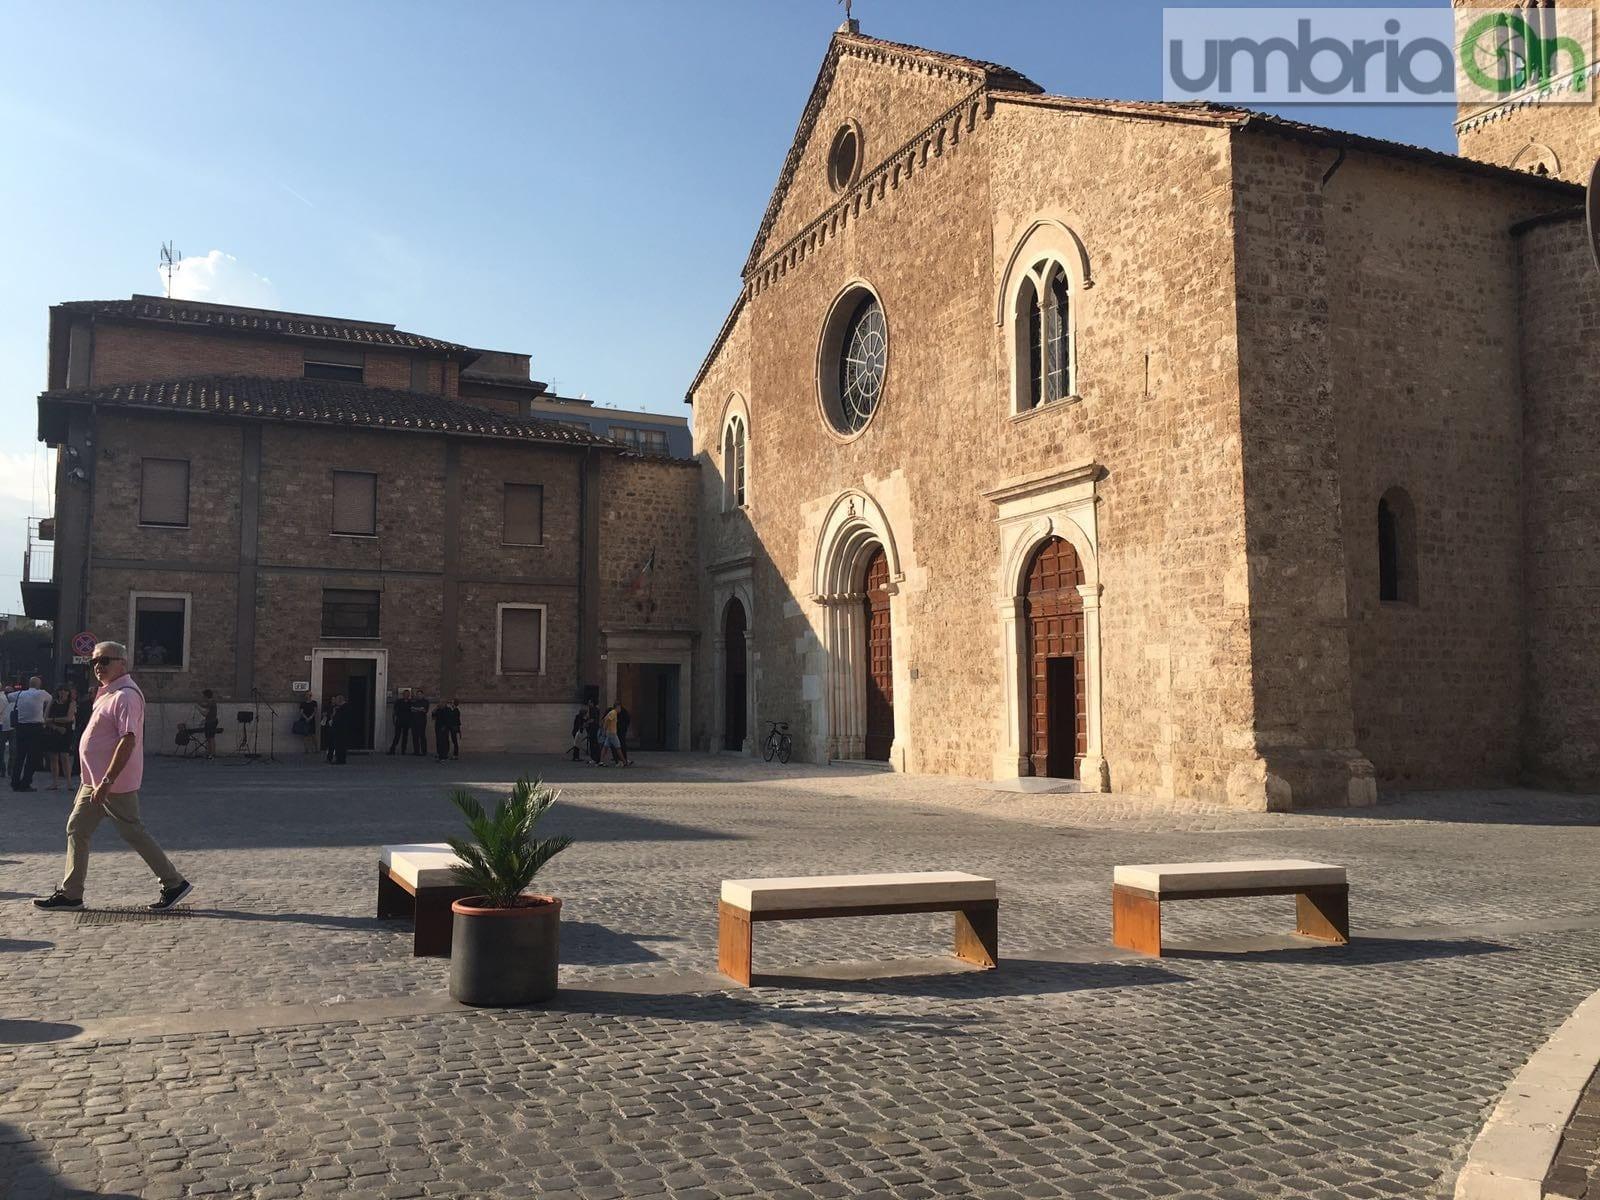 Terni san francesco nuova vita alla piazza umbriaon for Piazza san francesco prato